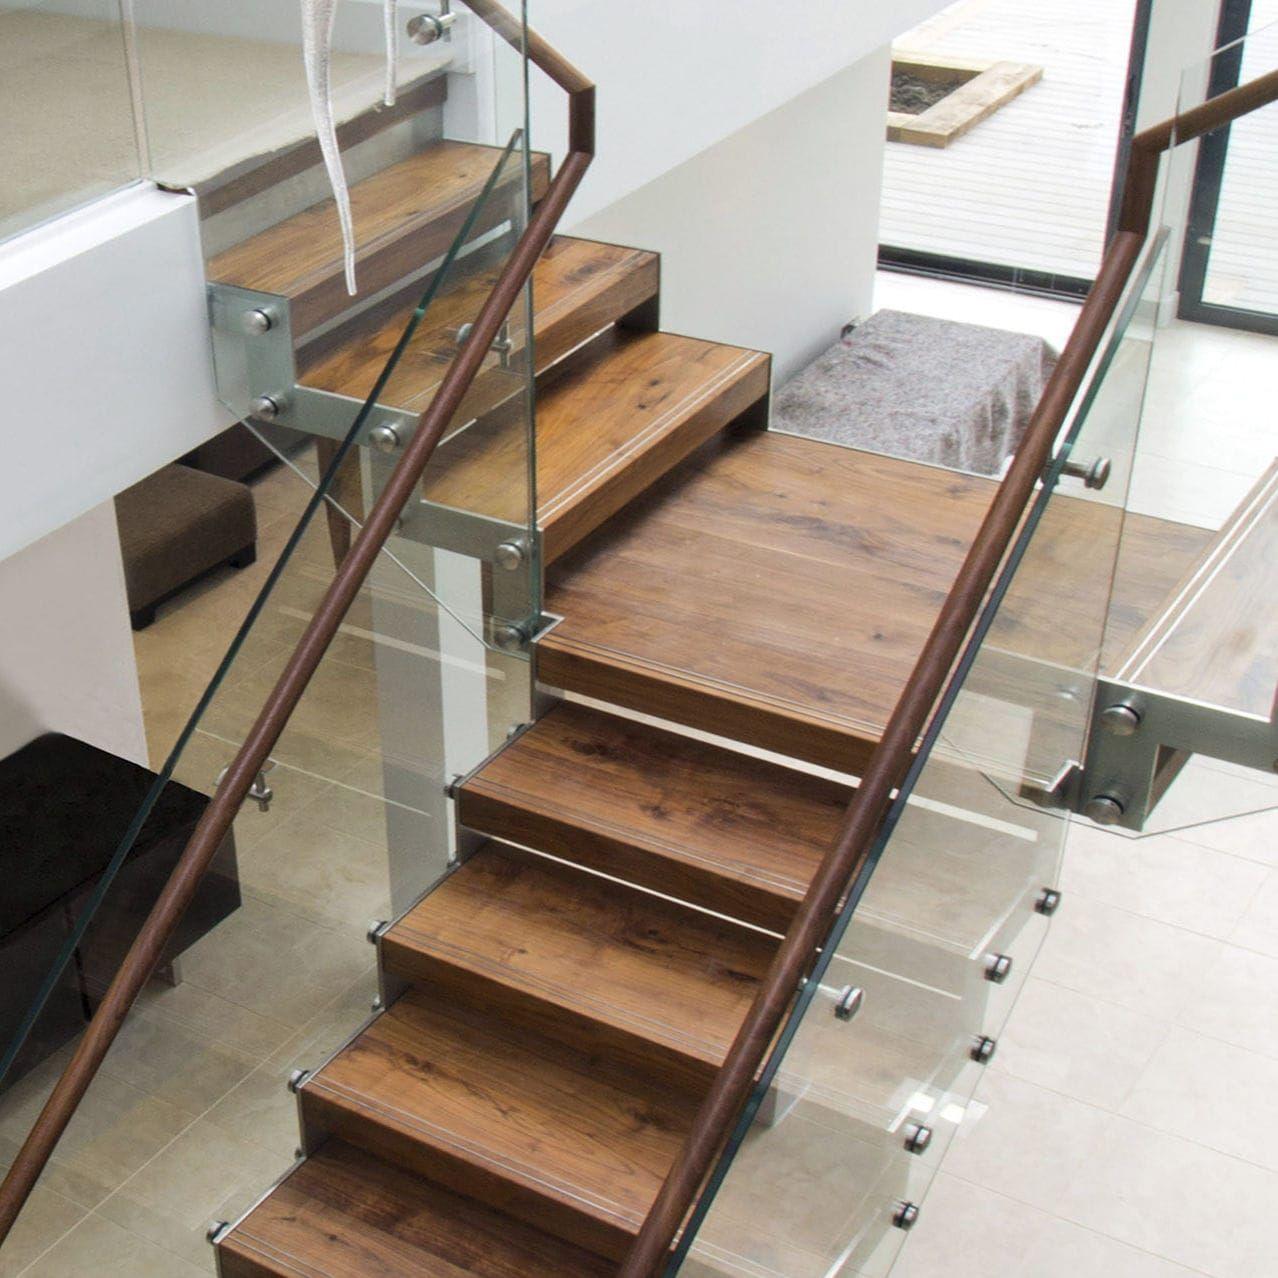 Escalera en l recta barandilla de vidrio estructura - Escaleras de cristal y madera ...